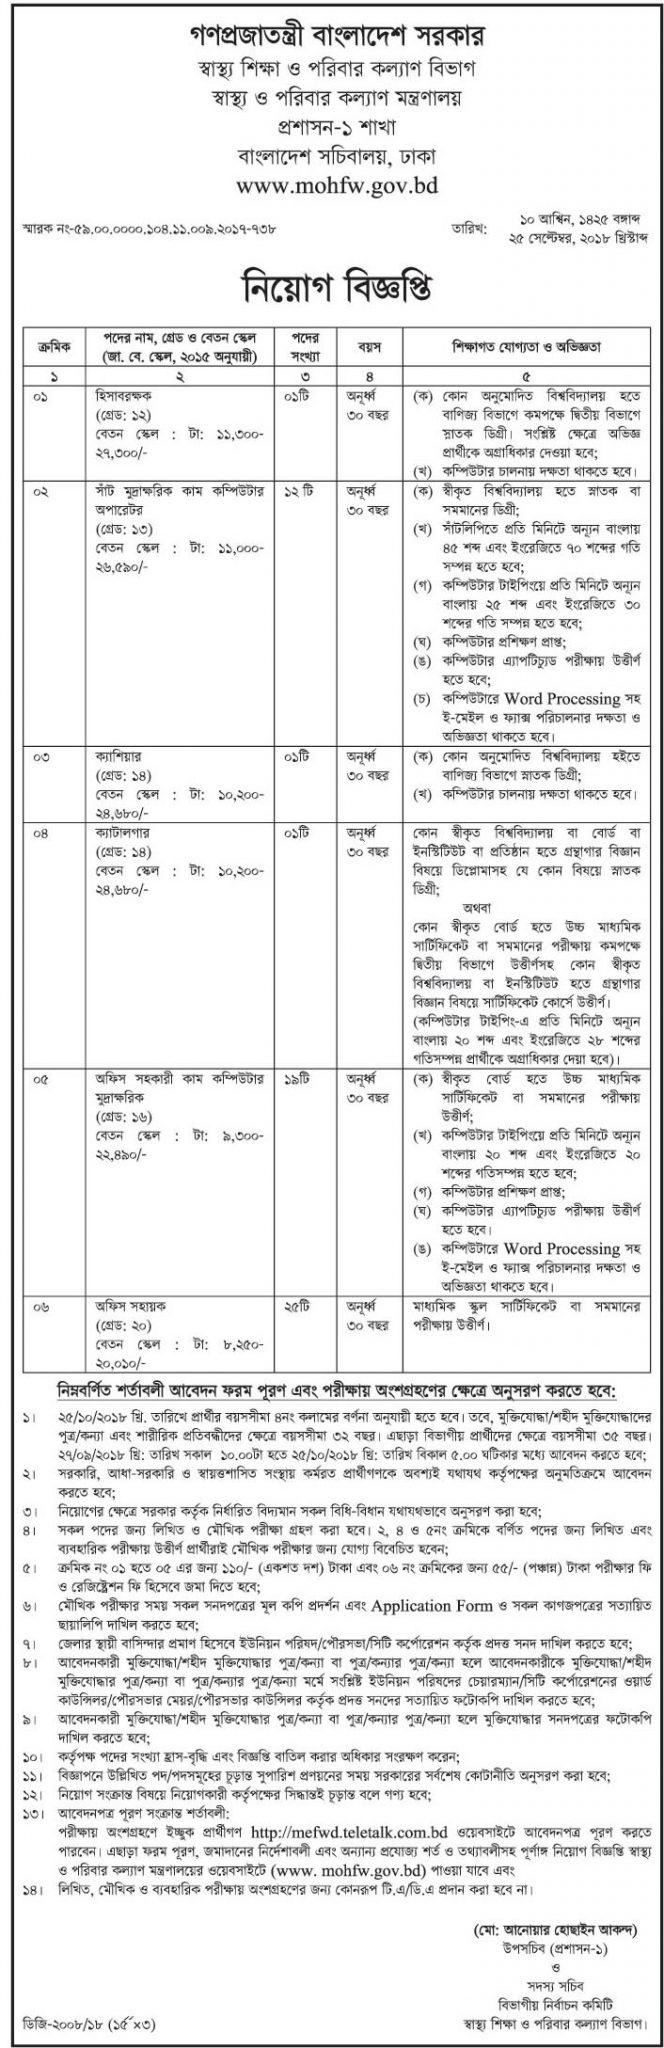 Ministry of Health and Family Welfare Job Circular 2018